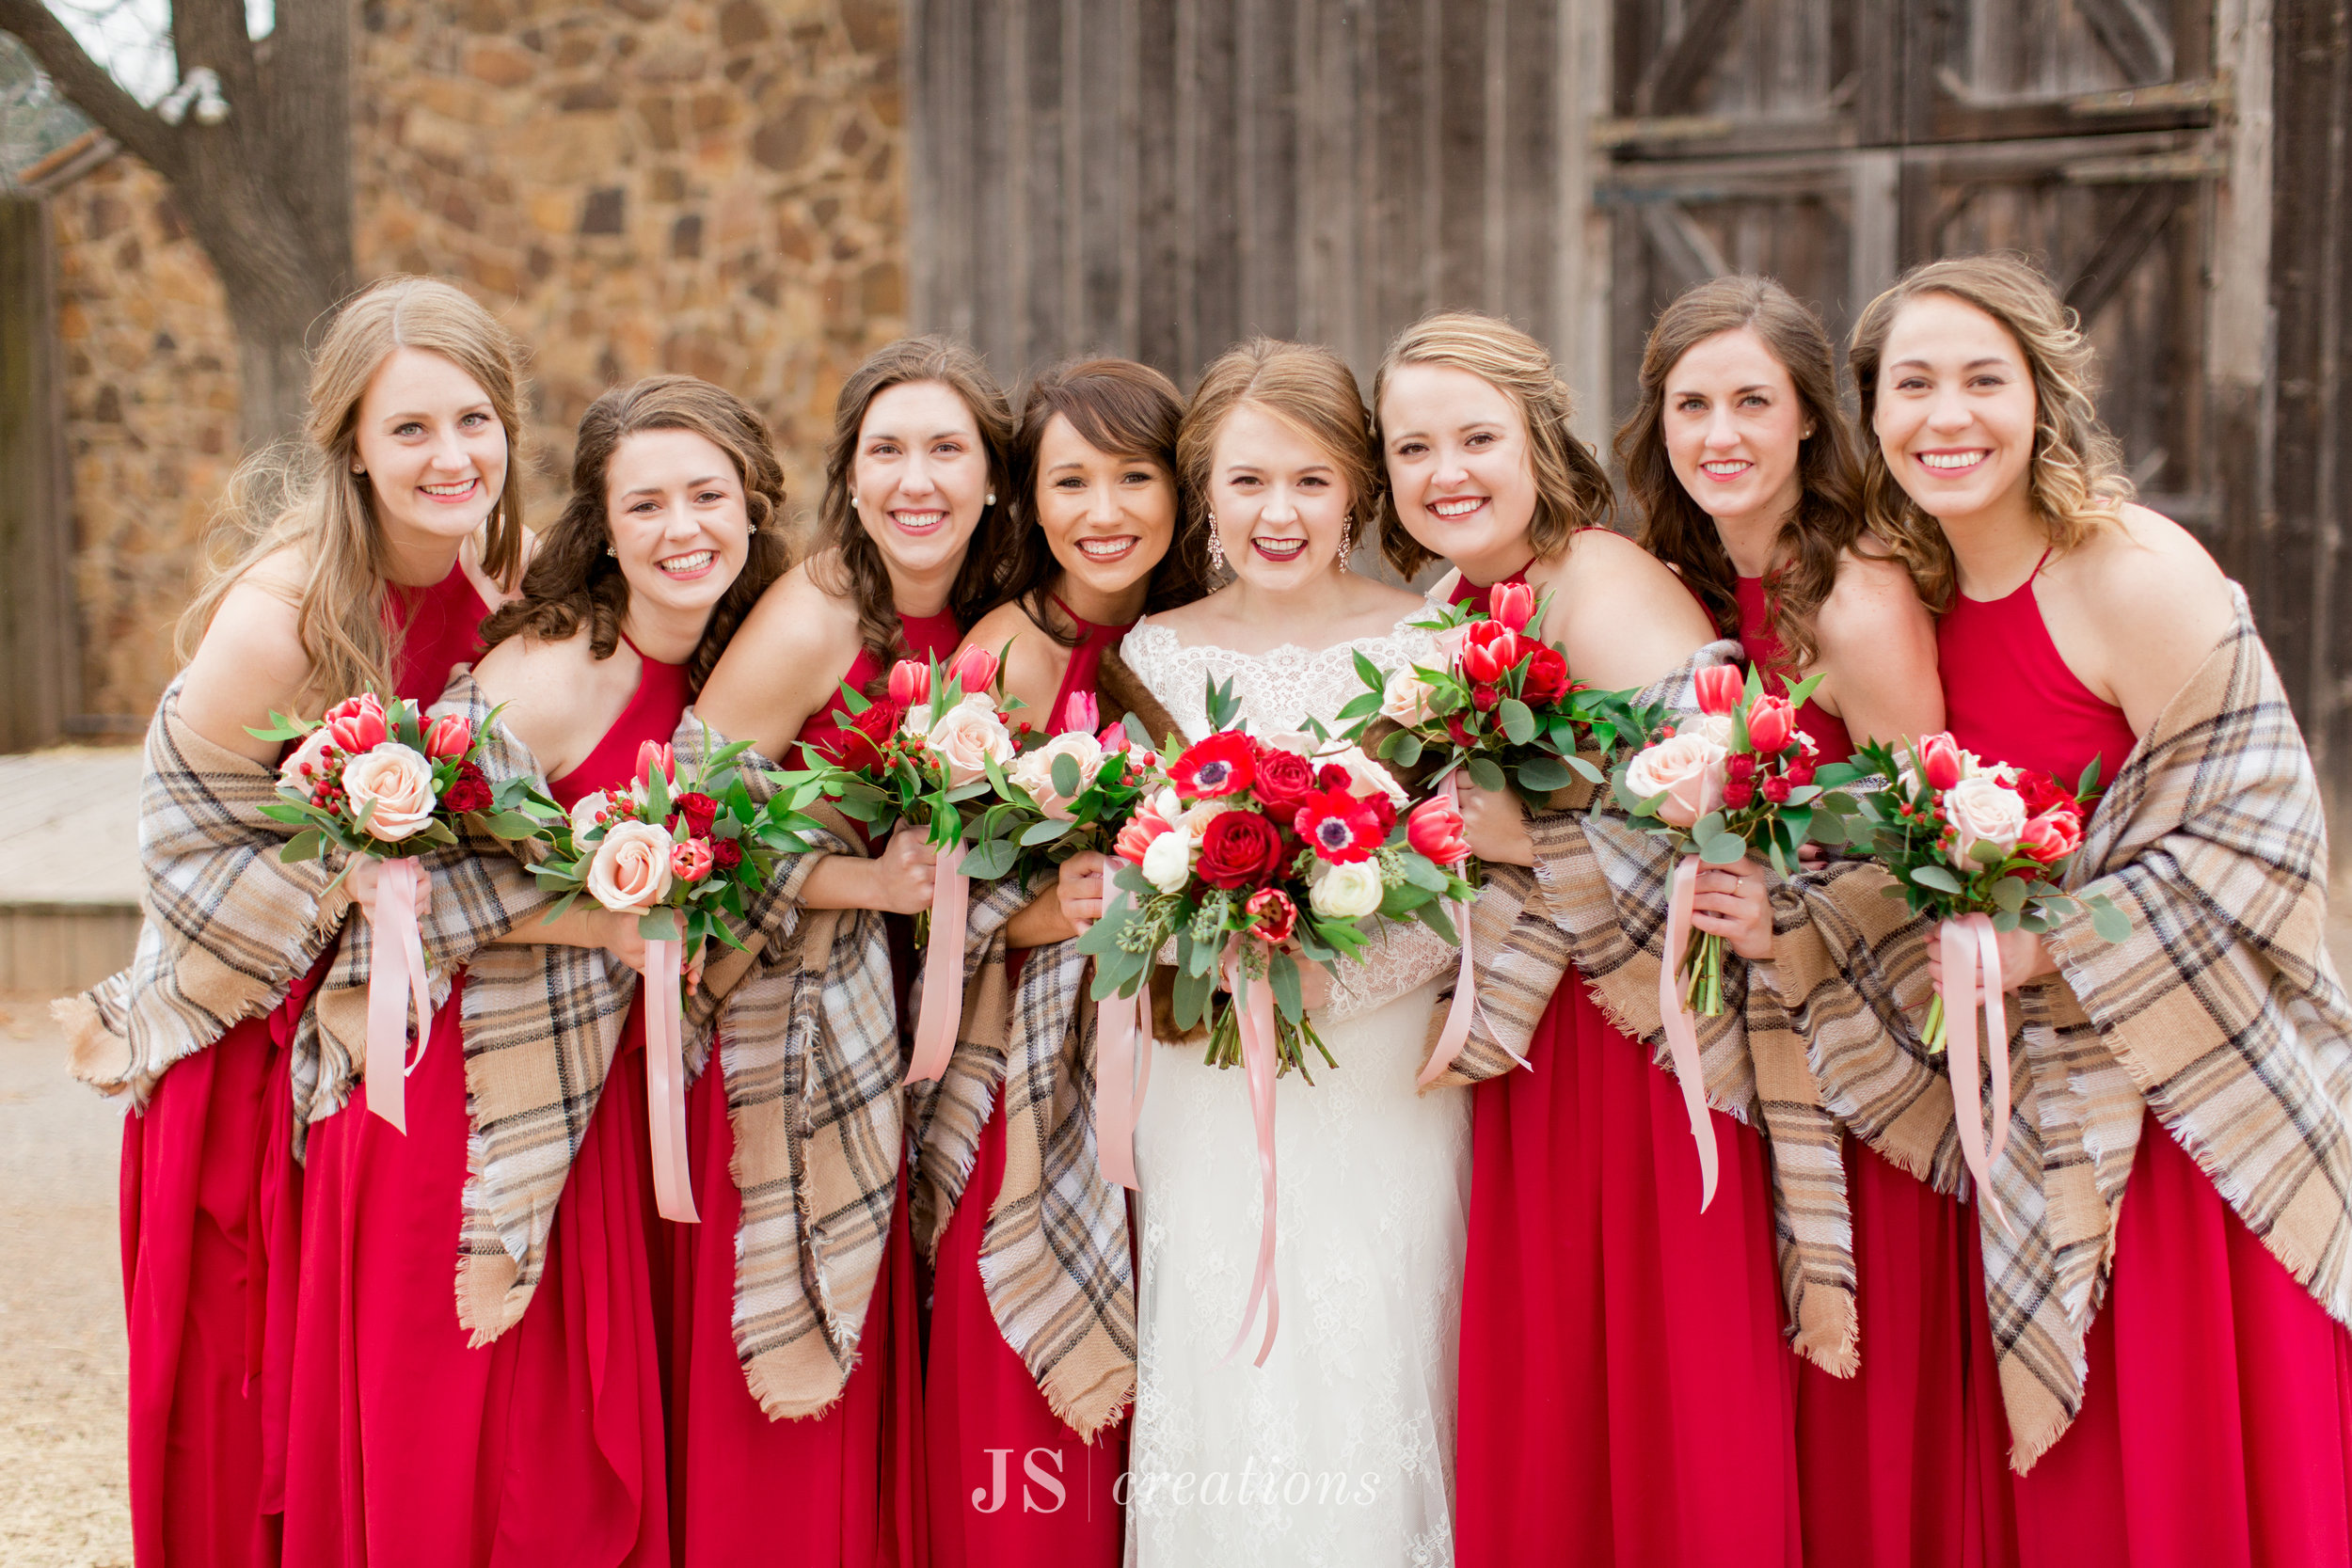 JSCreations_Weddings-284.jpg